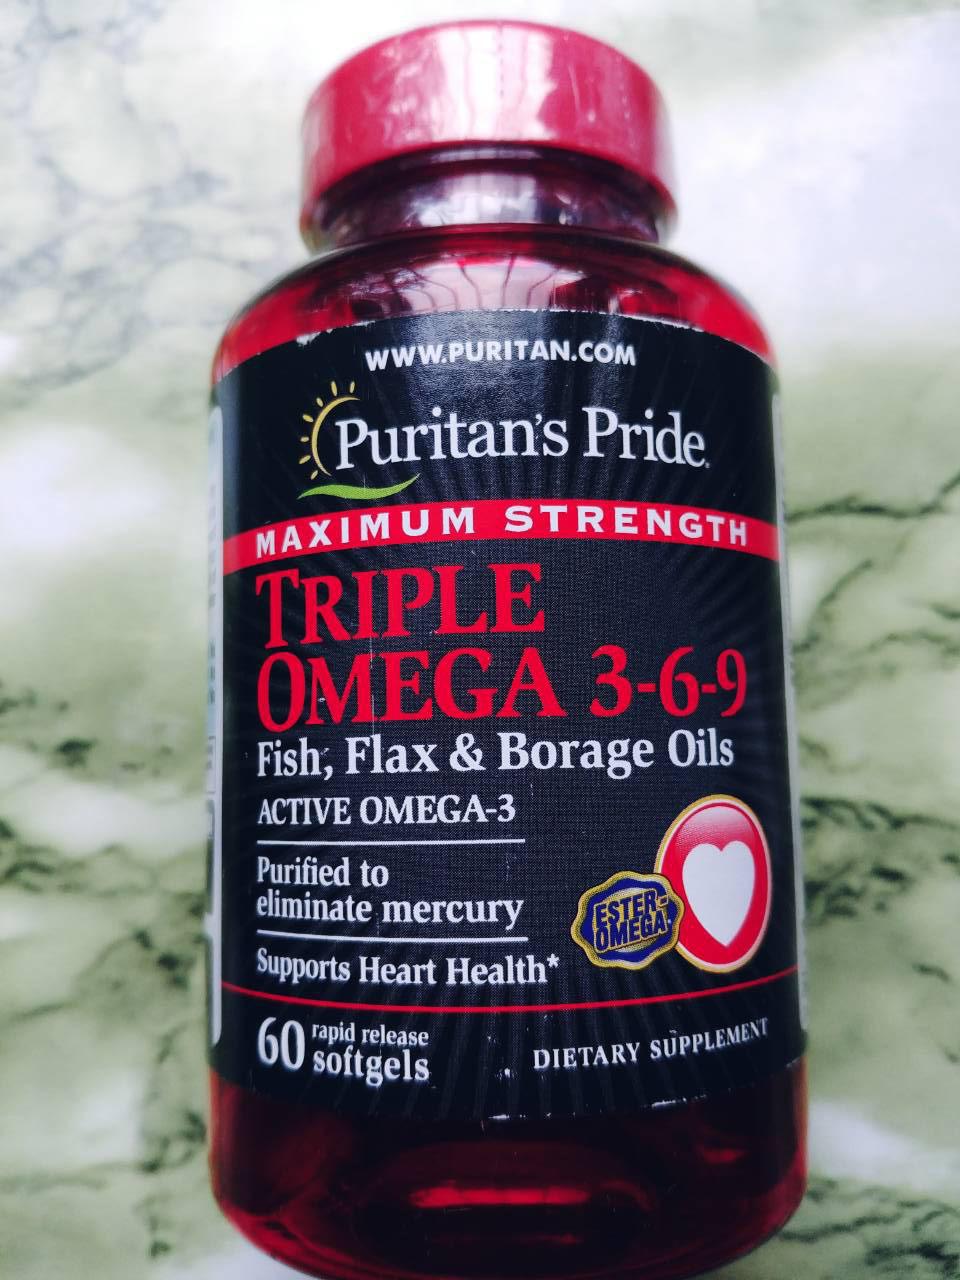 Жирные кислоты Омега 3-6-9 Puritan's Pride Maximum Strength Triple Omega